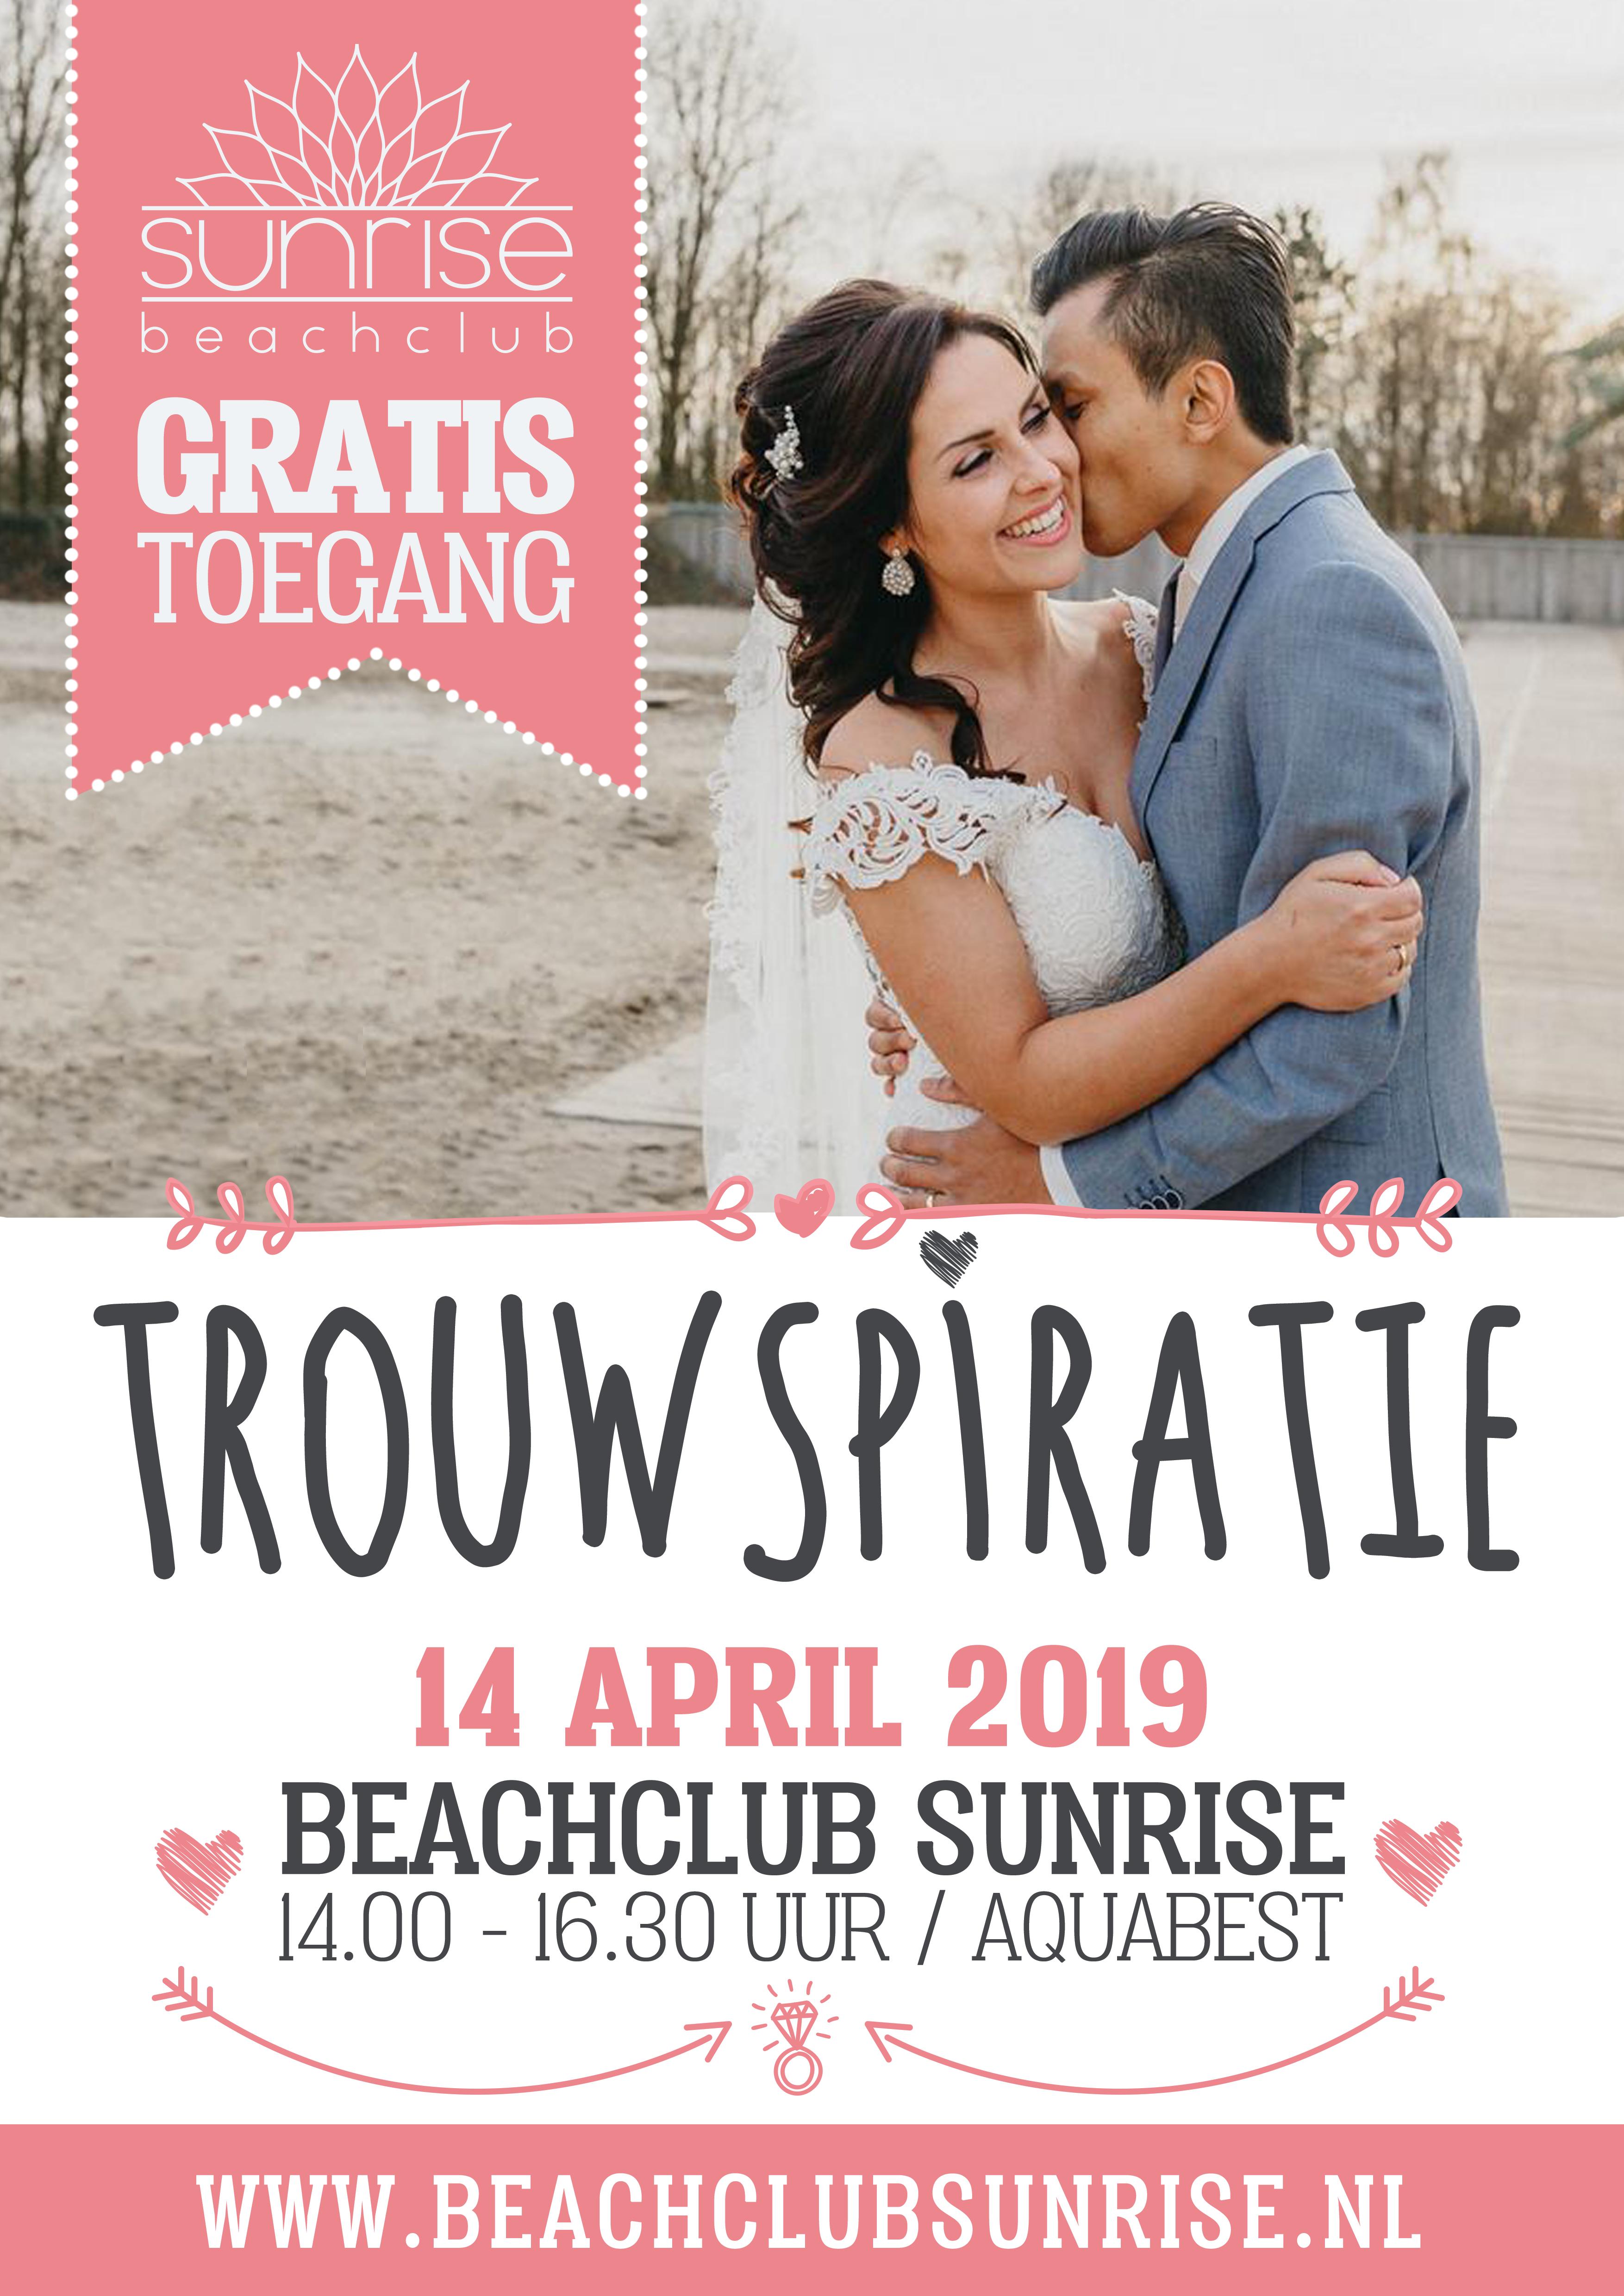 trouwspiratie beachclub sunrise, aqua best, weddingbeurs, trouwbeurs, trouw inspiratie